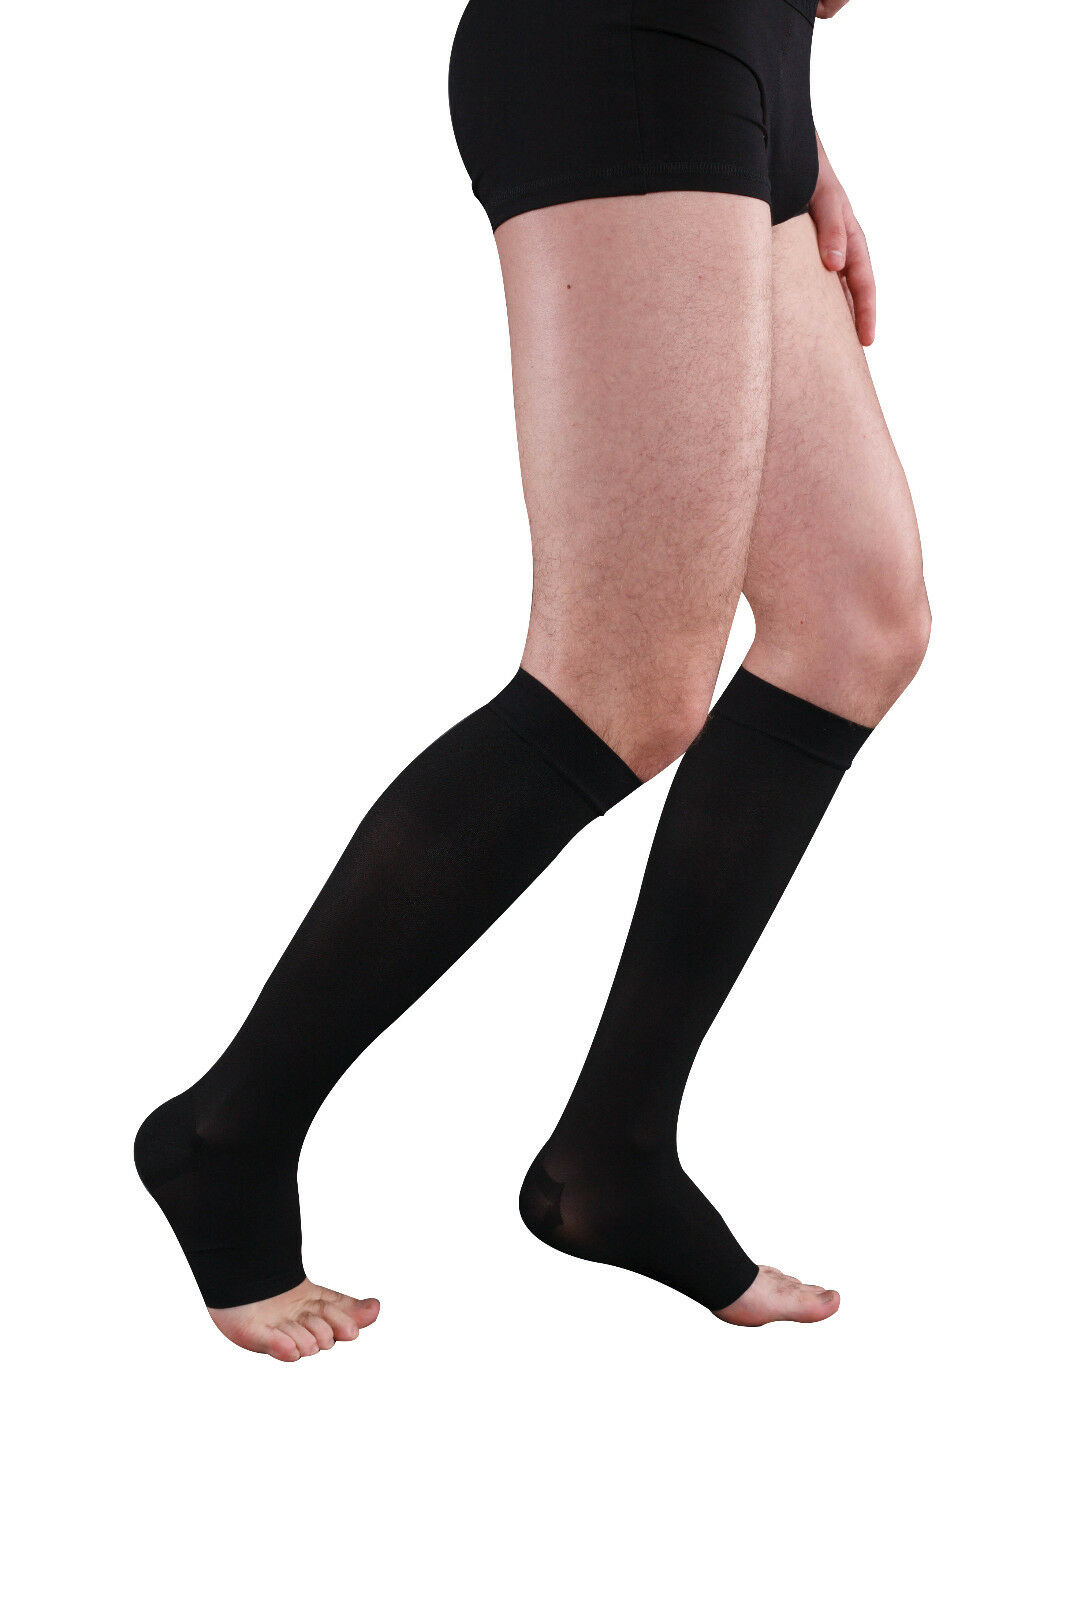 Compression Socks Knee Socks Ad Class 1 2 Or 3 Support Socks Ebay